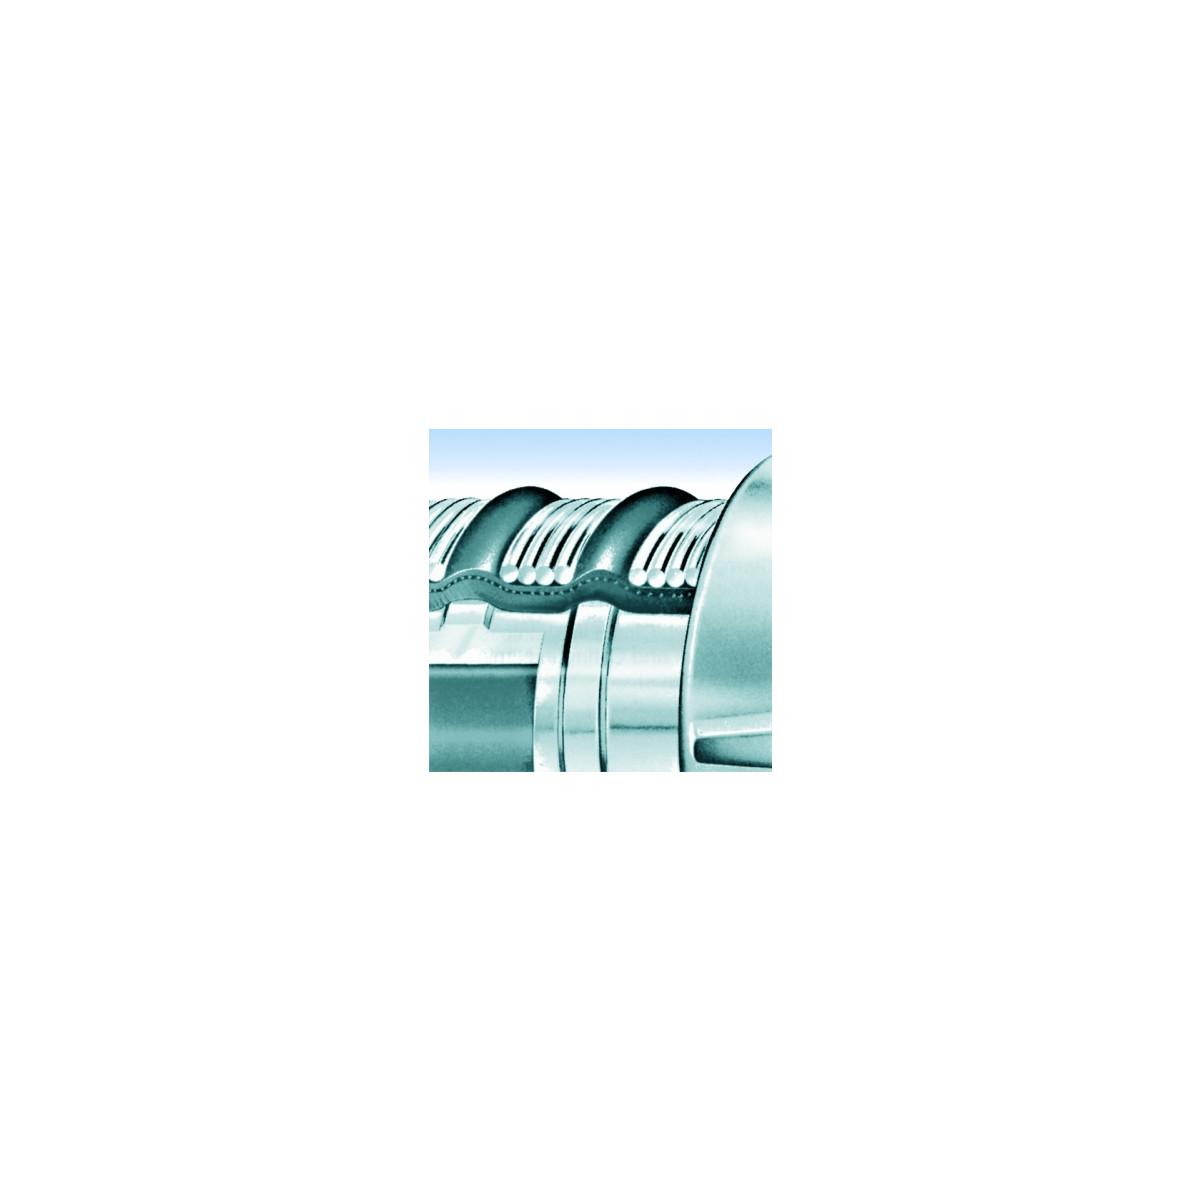 Gartendraht Rolle Zaun Bastel Draht Gr/ün Spanndraht 100 m lang PVC Mantelung verzinkter Eisendraht korrosionsbest/ändig Drahtseil Drahtst/ärke 1,4 mm Zaunzubeh/ör Universal Bindedraht